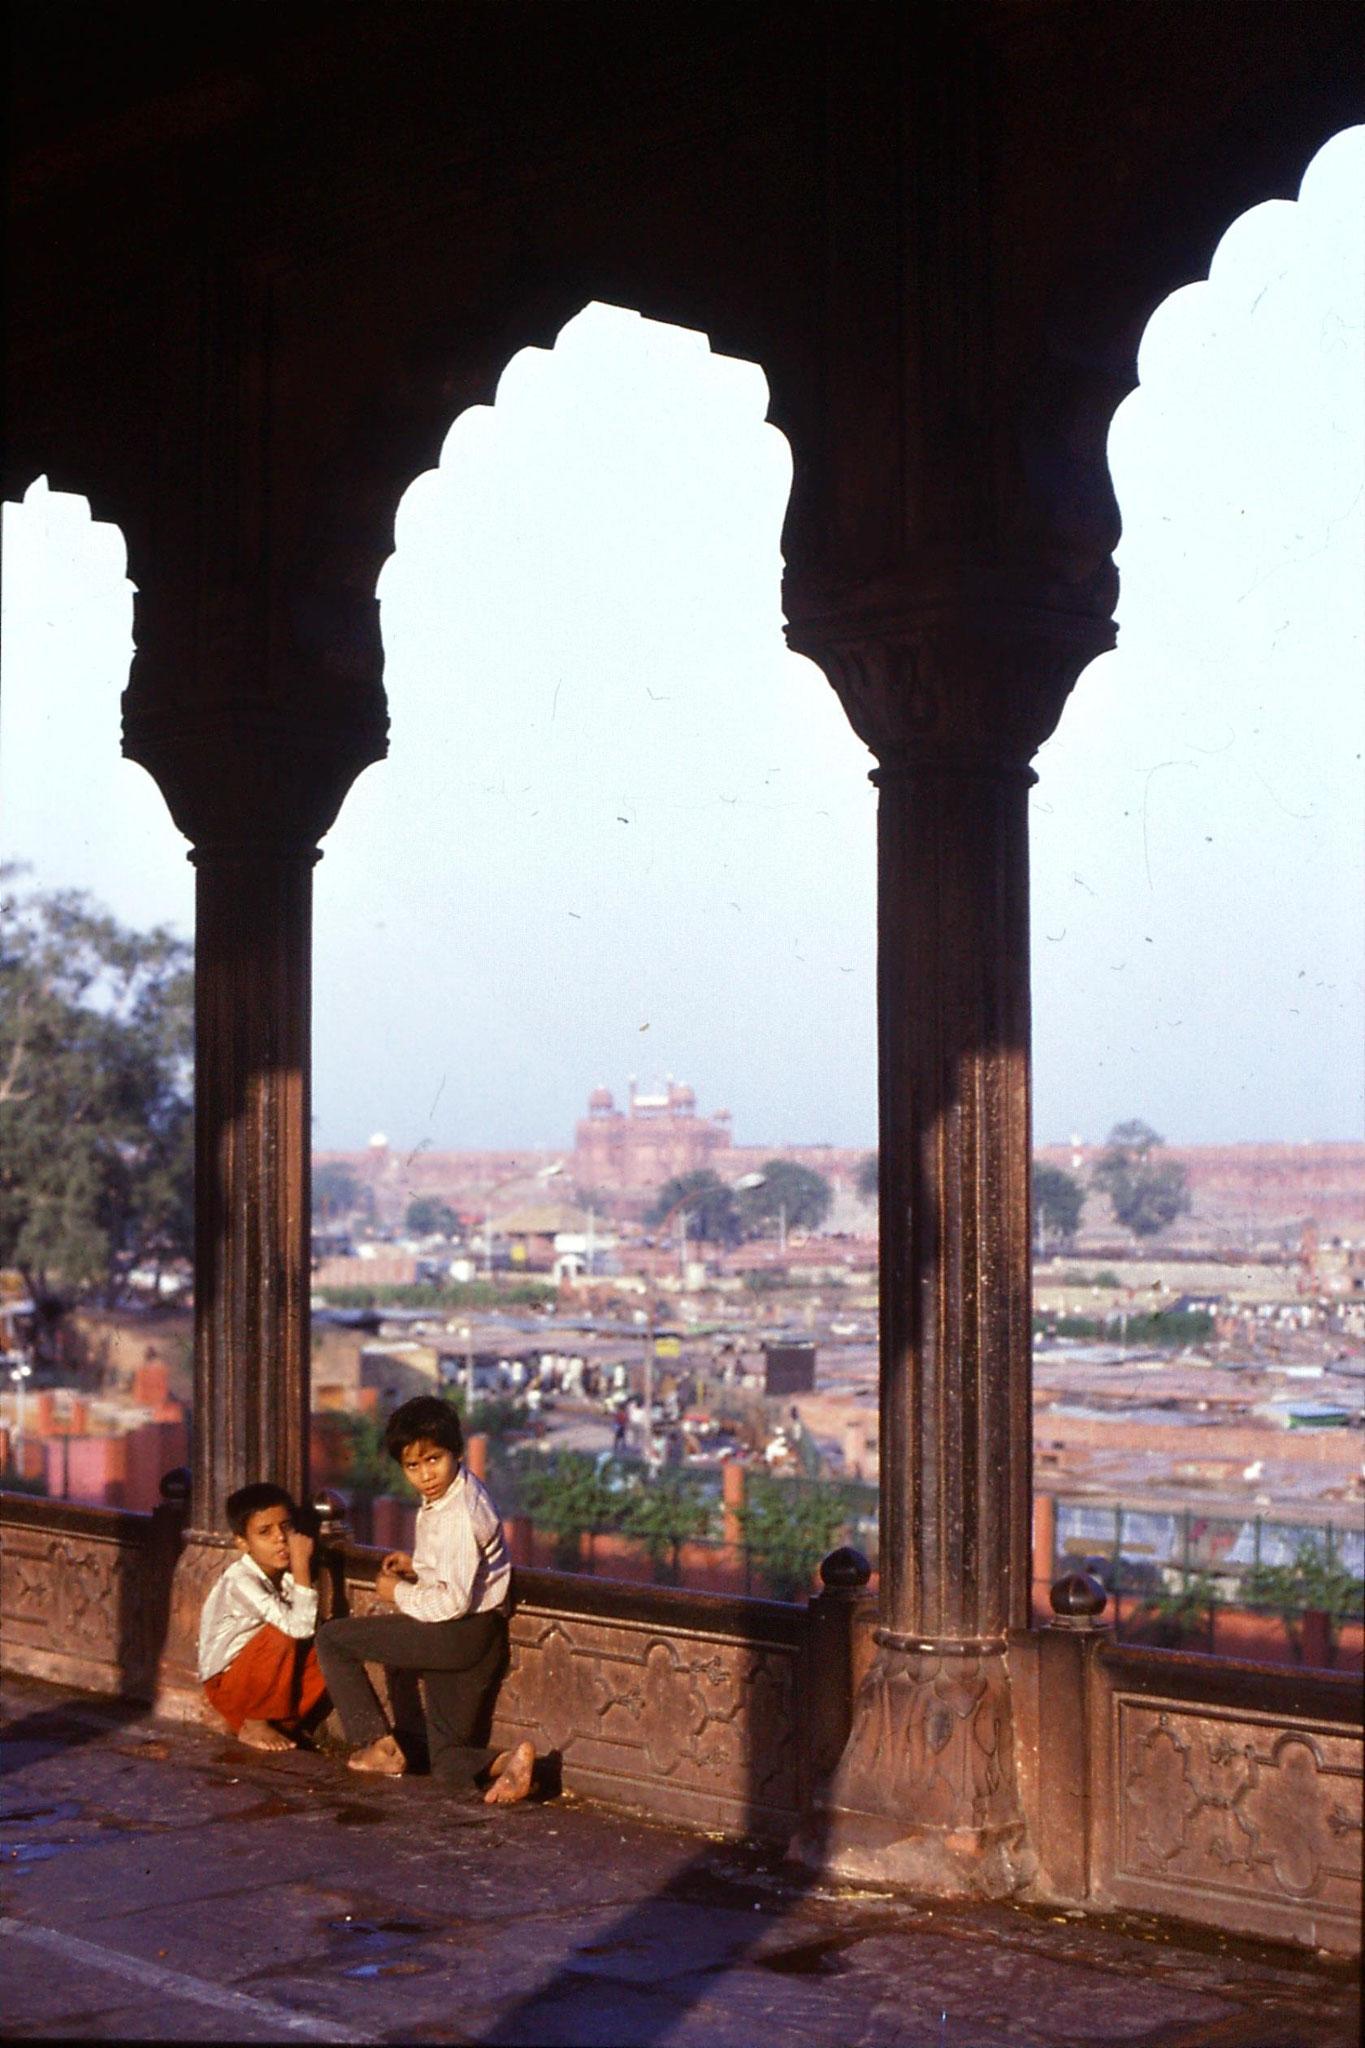 24/11/1989: 25: Delhi Red Fort & Jami Masjid